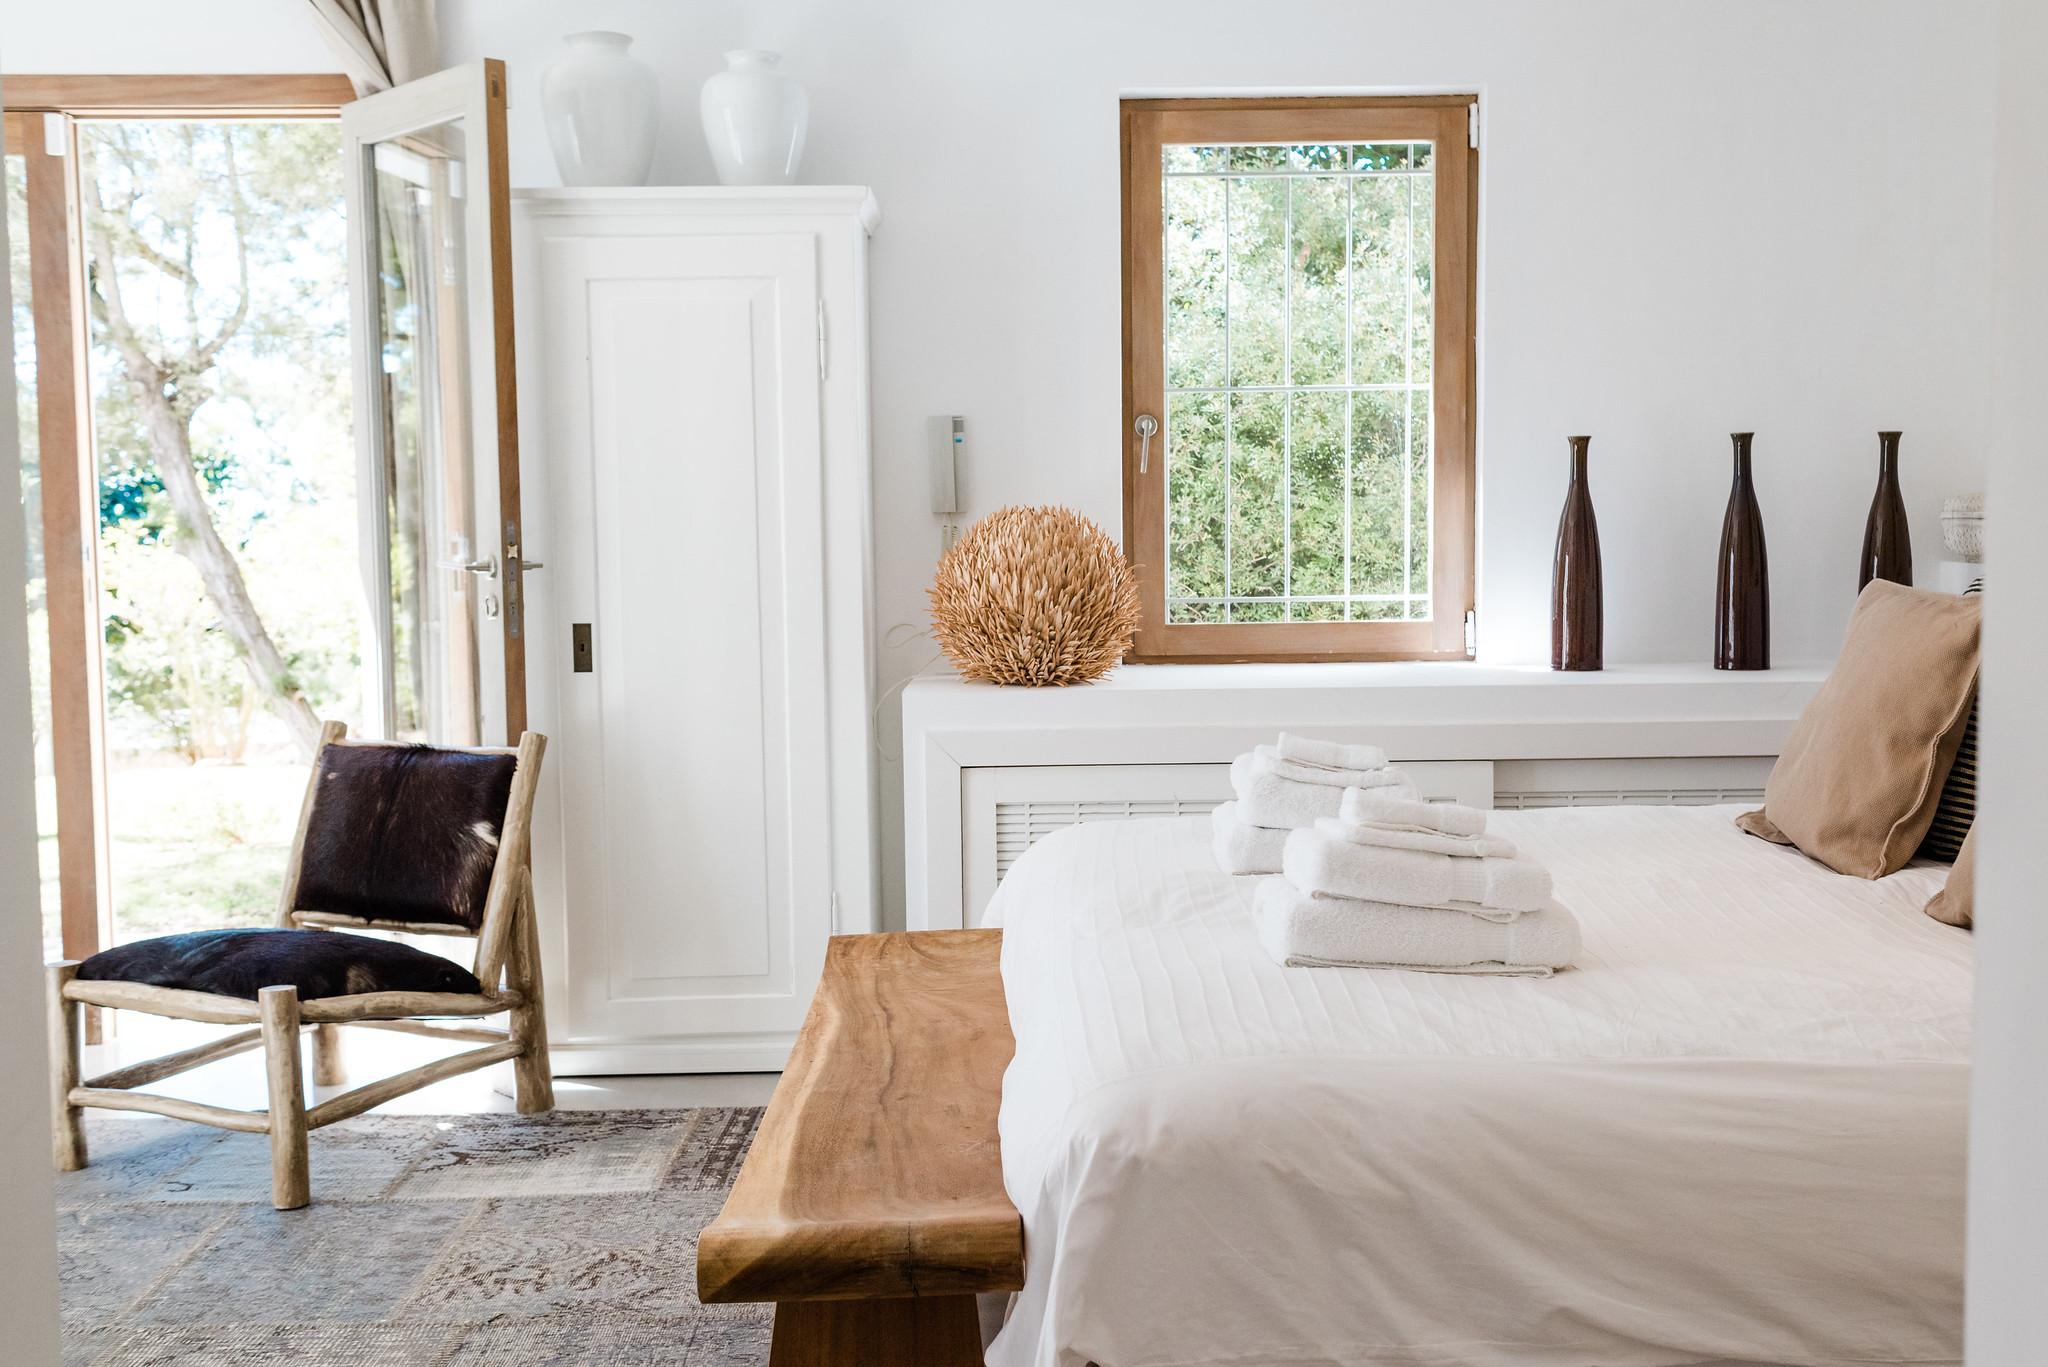 https://www.white-ibiza.com/wp-content/uploads/2020/06/white-ibiza-villas-casa-nyah-interior-bedroom-7.jpg